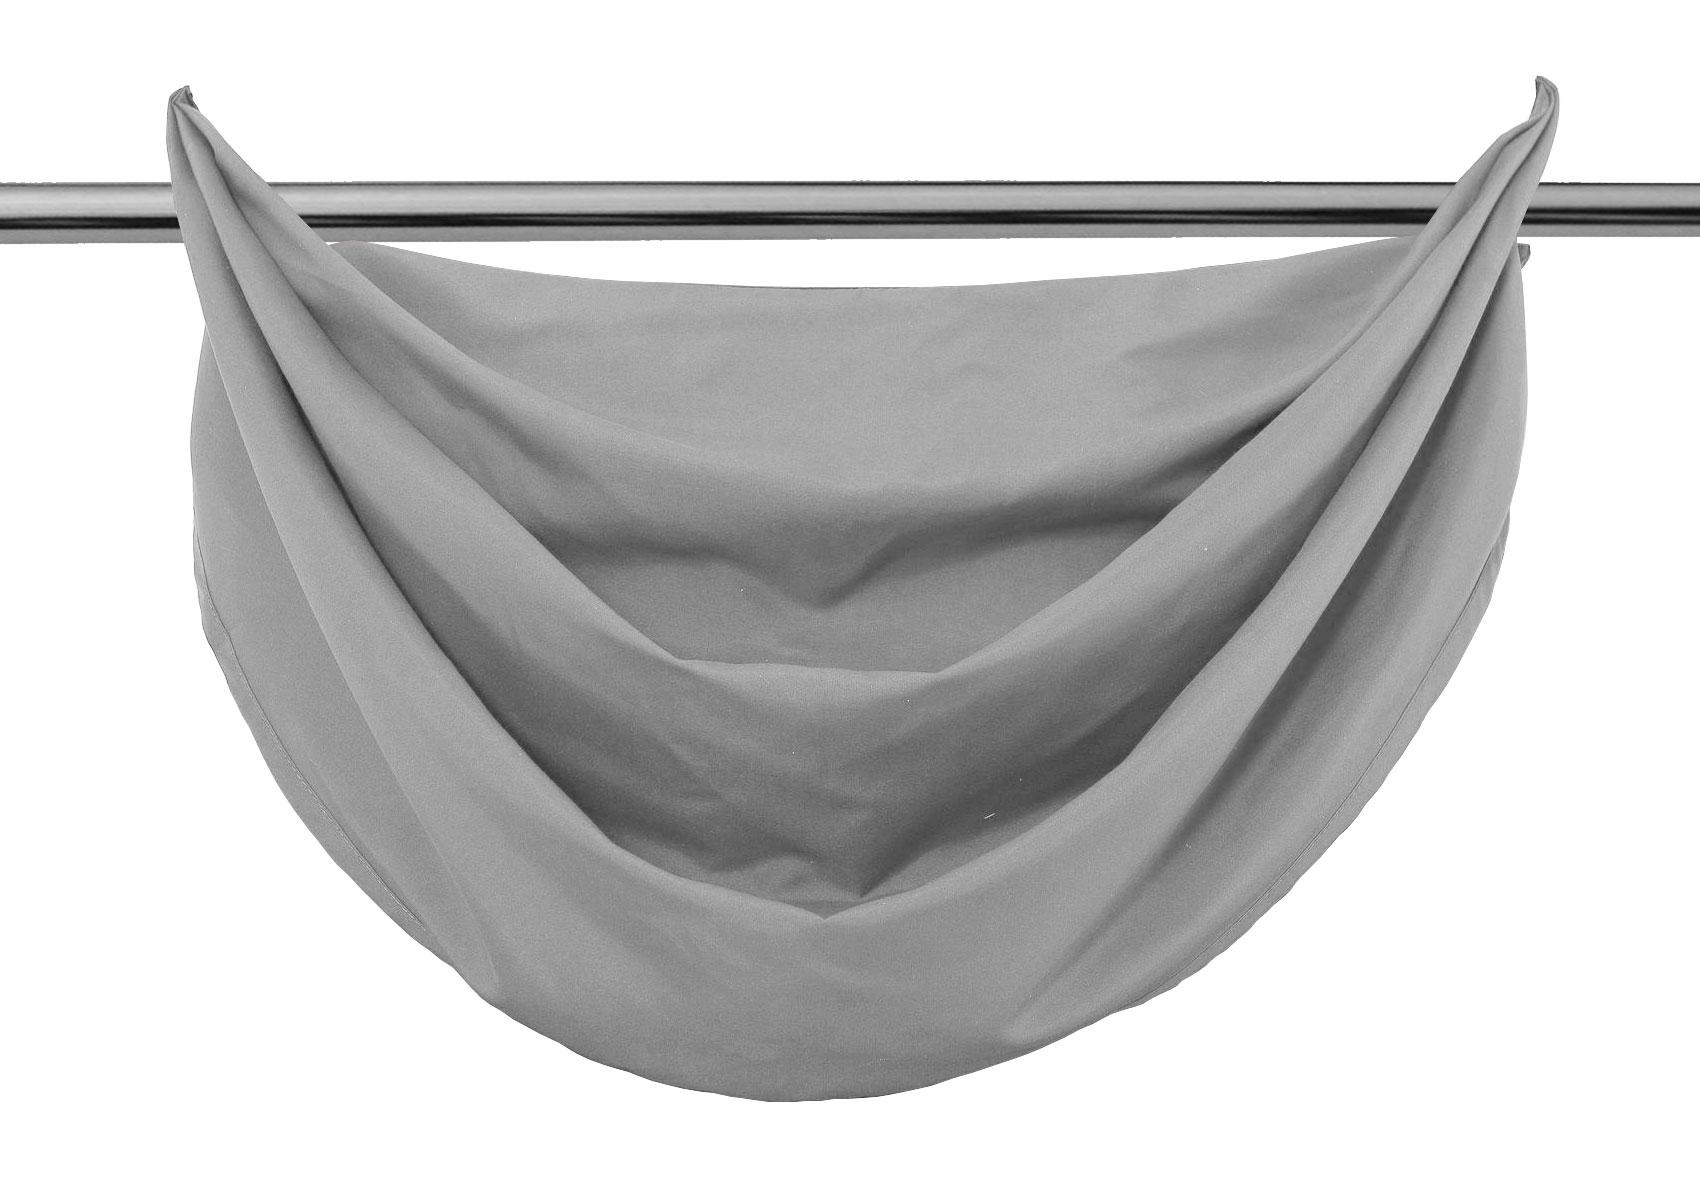 querbehang segeltuch microsatin blickdicht sen hxb 60x80 cm grau ebay. Black Bedroom Furniture Sets. Home Design Ideas